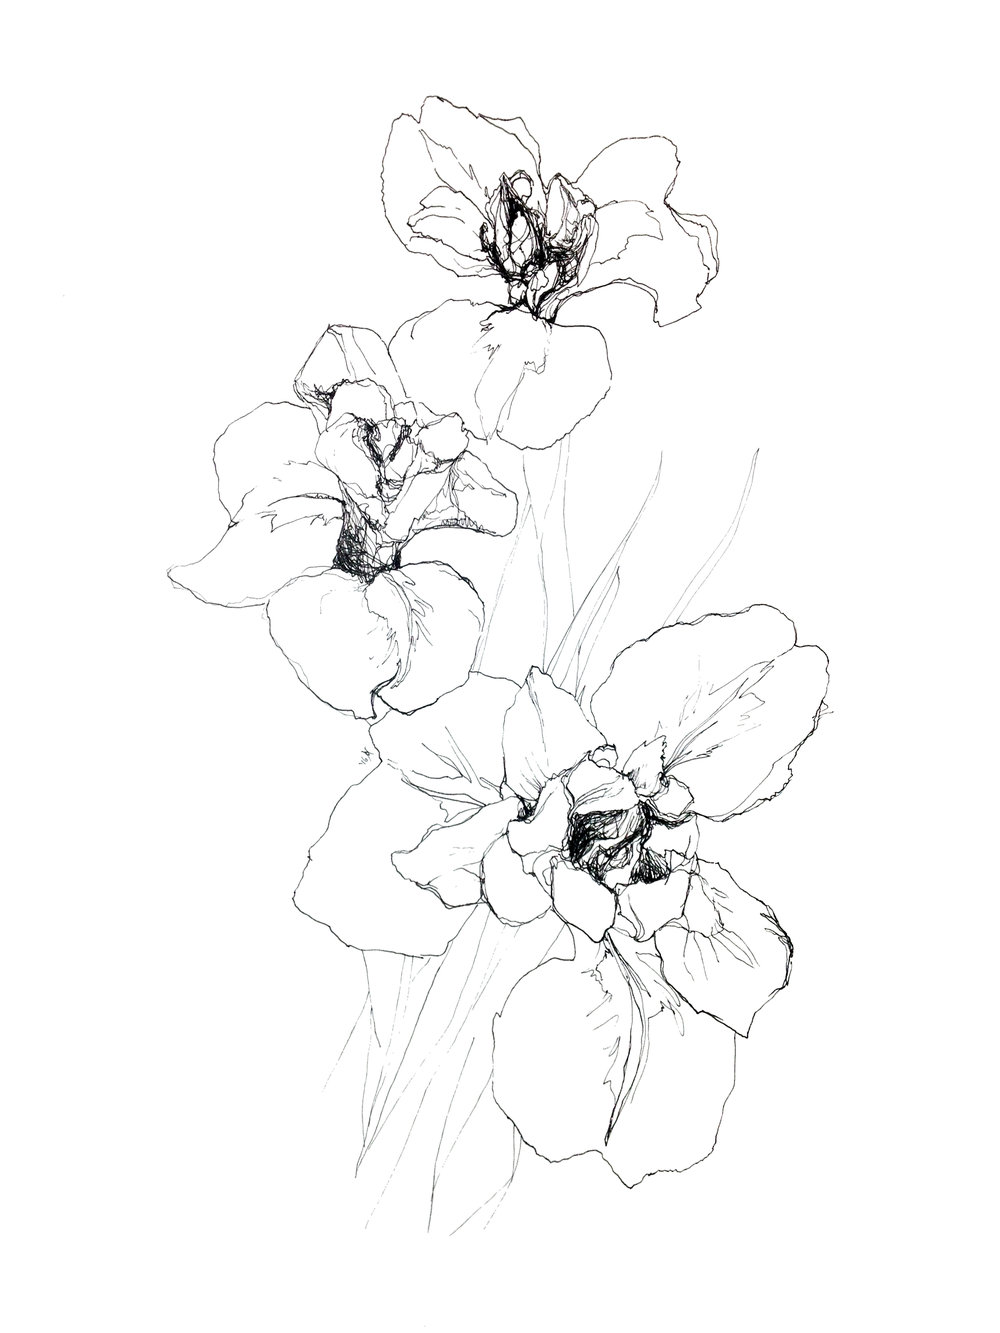 'Iris',Staedler pigment liner,450 x 320, 2016